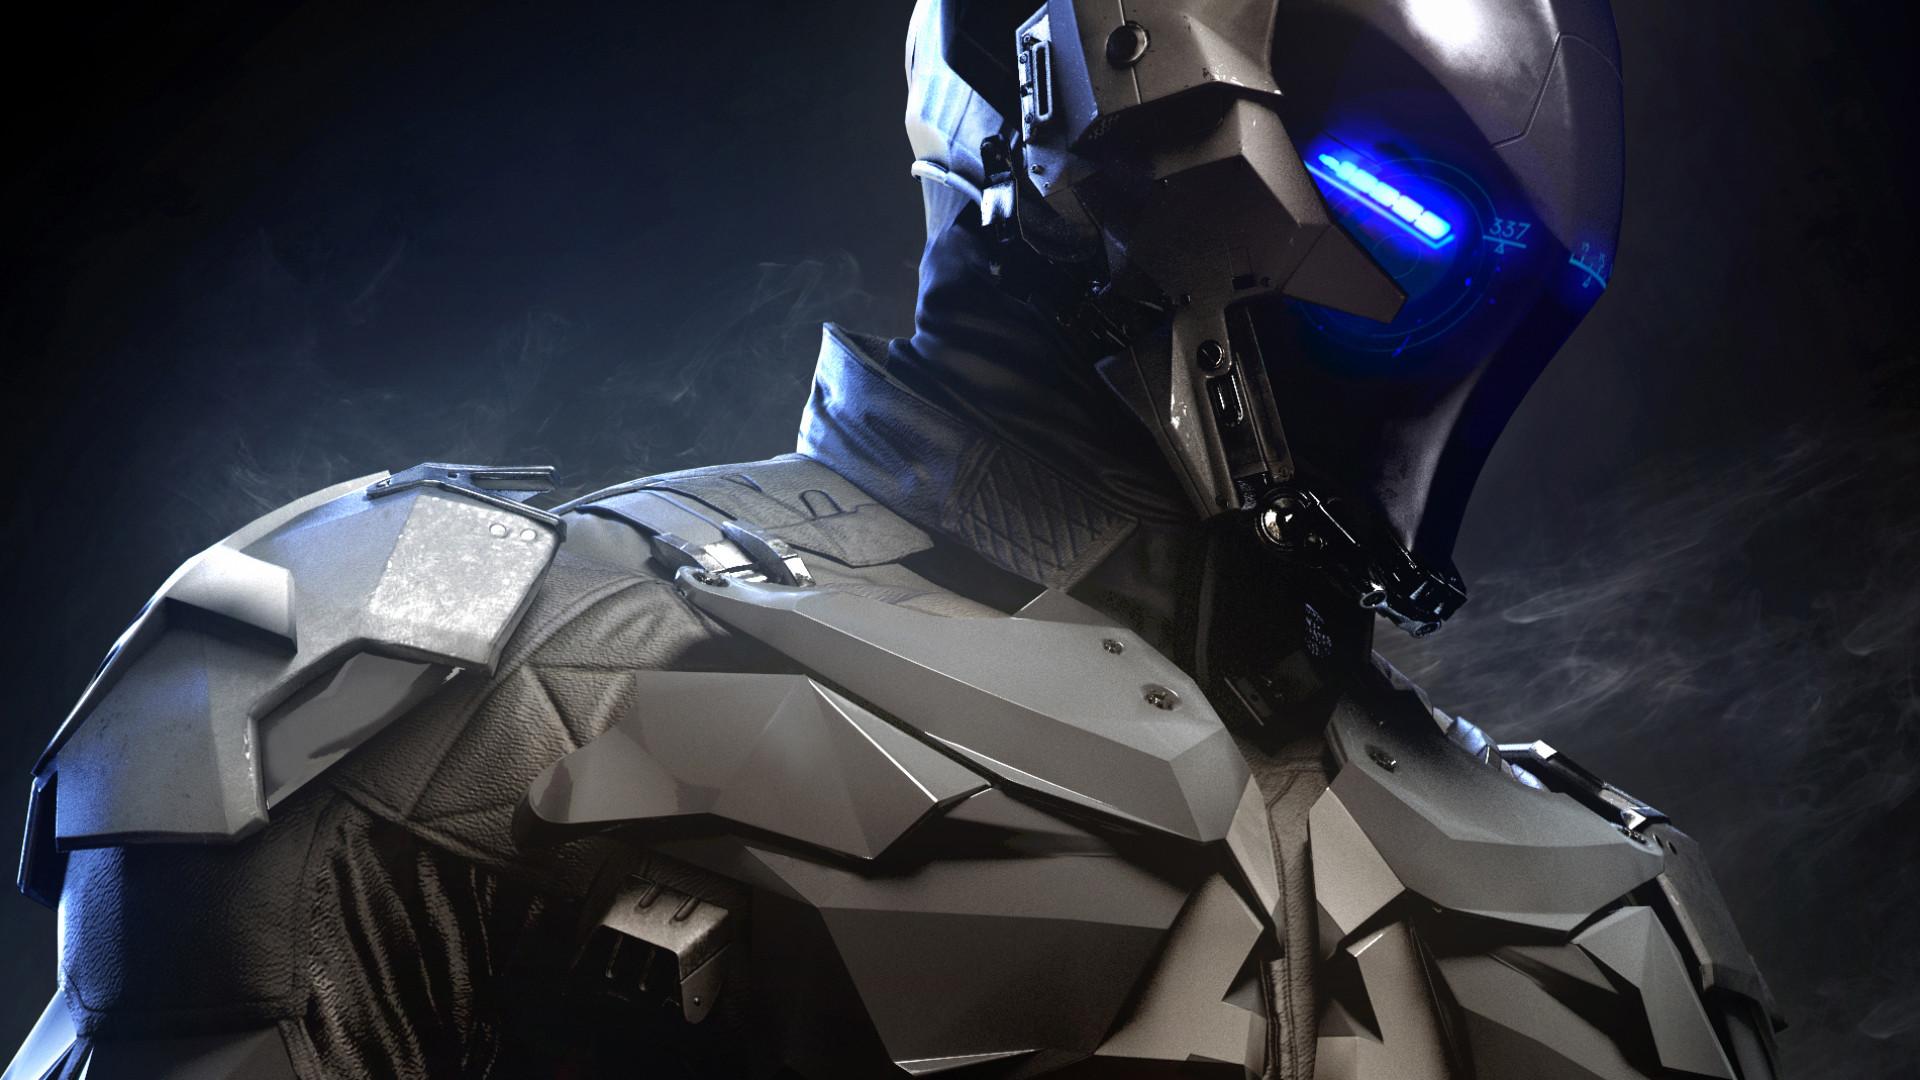 Batman Arkham Knight Jeux Video Fond Ecran Wallpaper Batman Arkham Knight Iron Suit 1296563 Hd Wallpaper Backgrounds Download